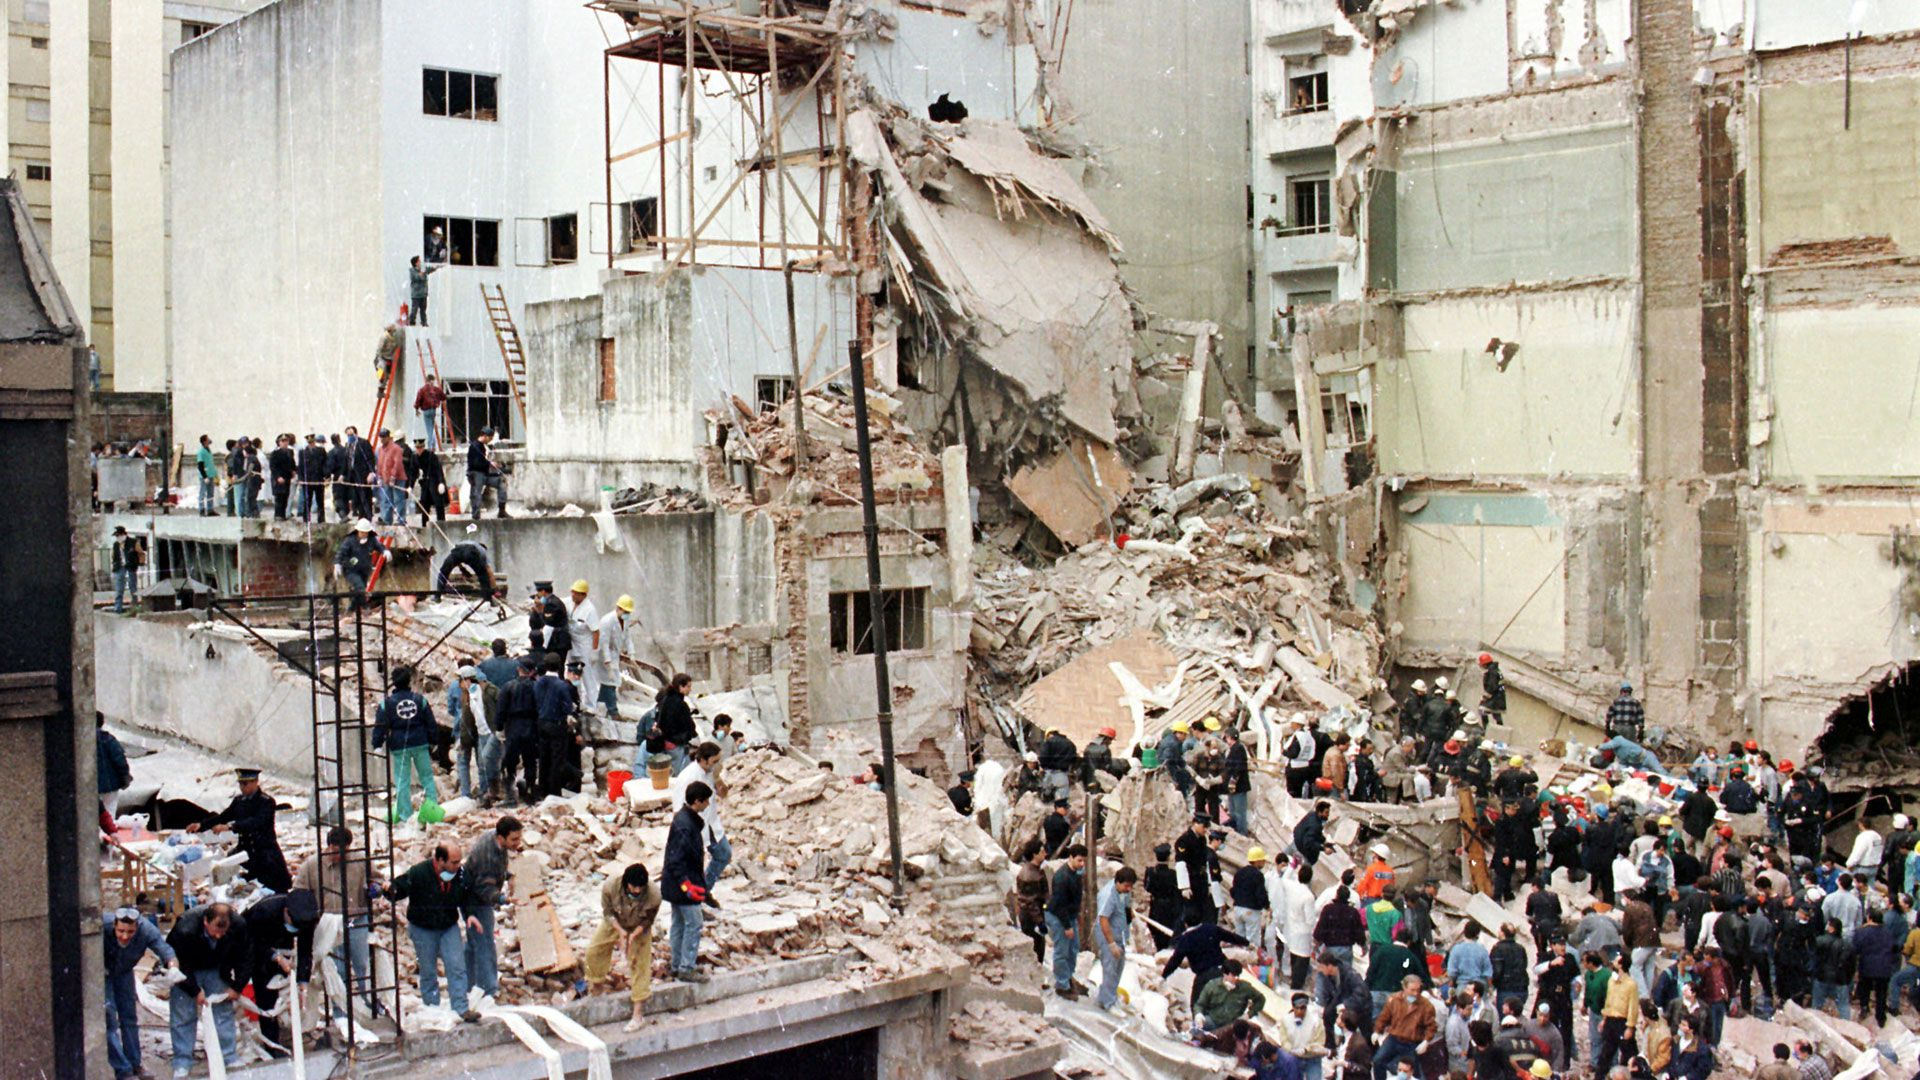 La bomba explotó a las 9.53 del 18 de julio de 1994. (Reuters)